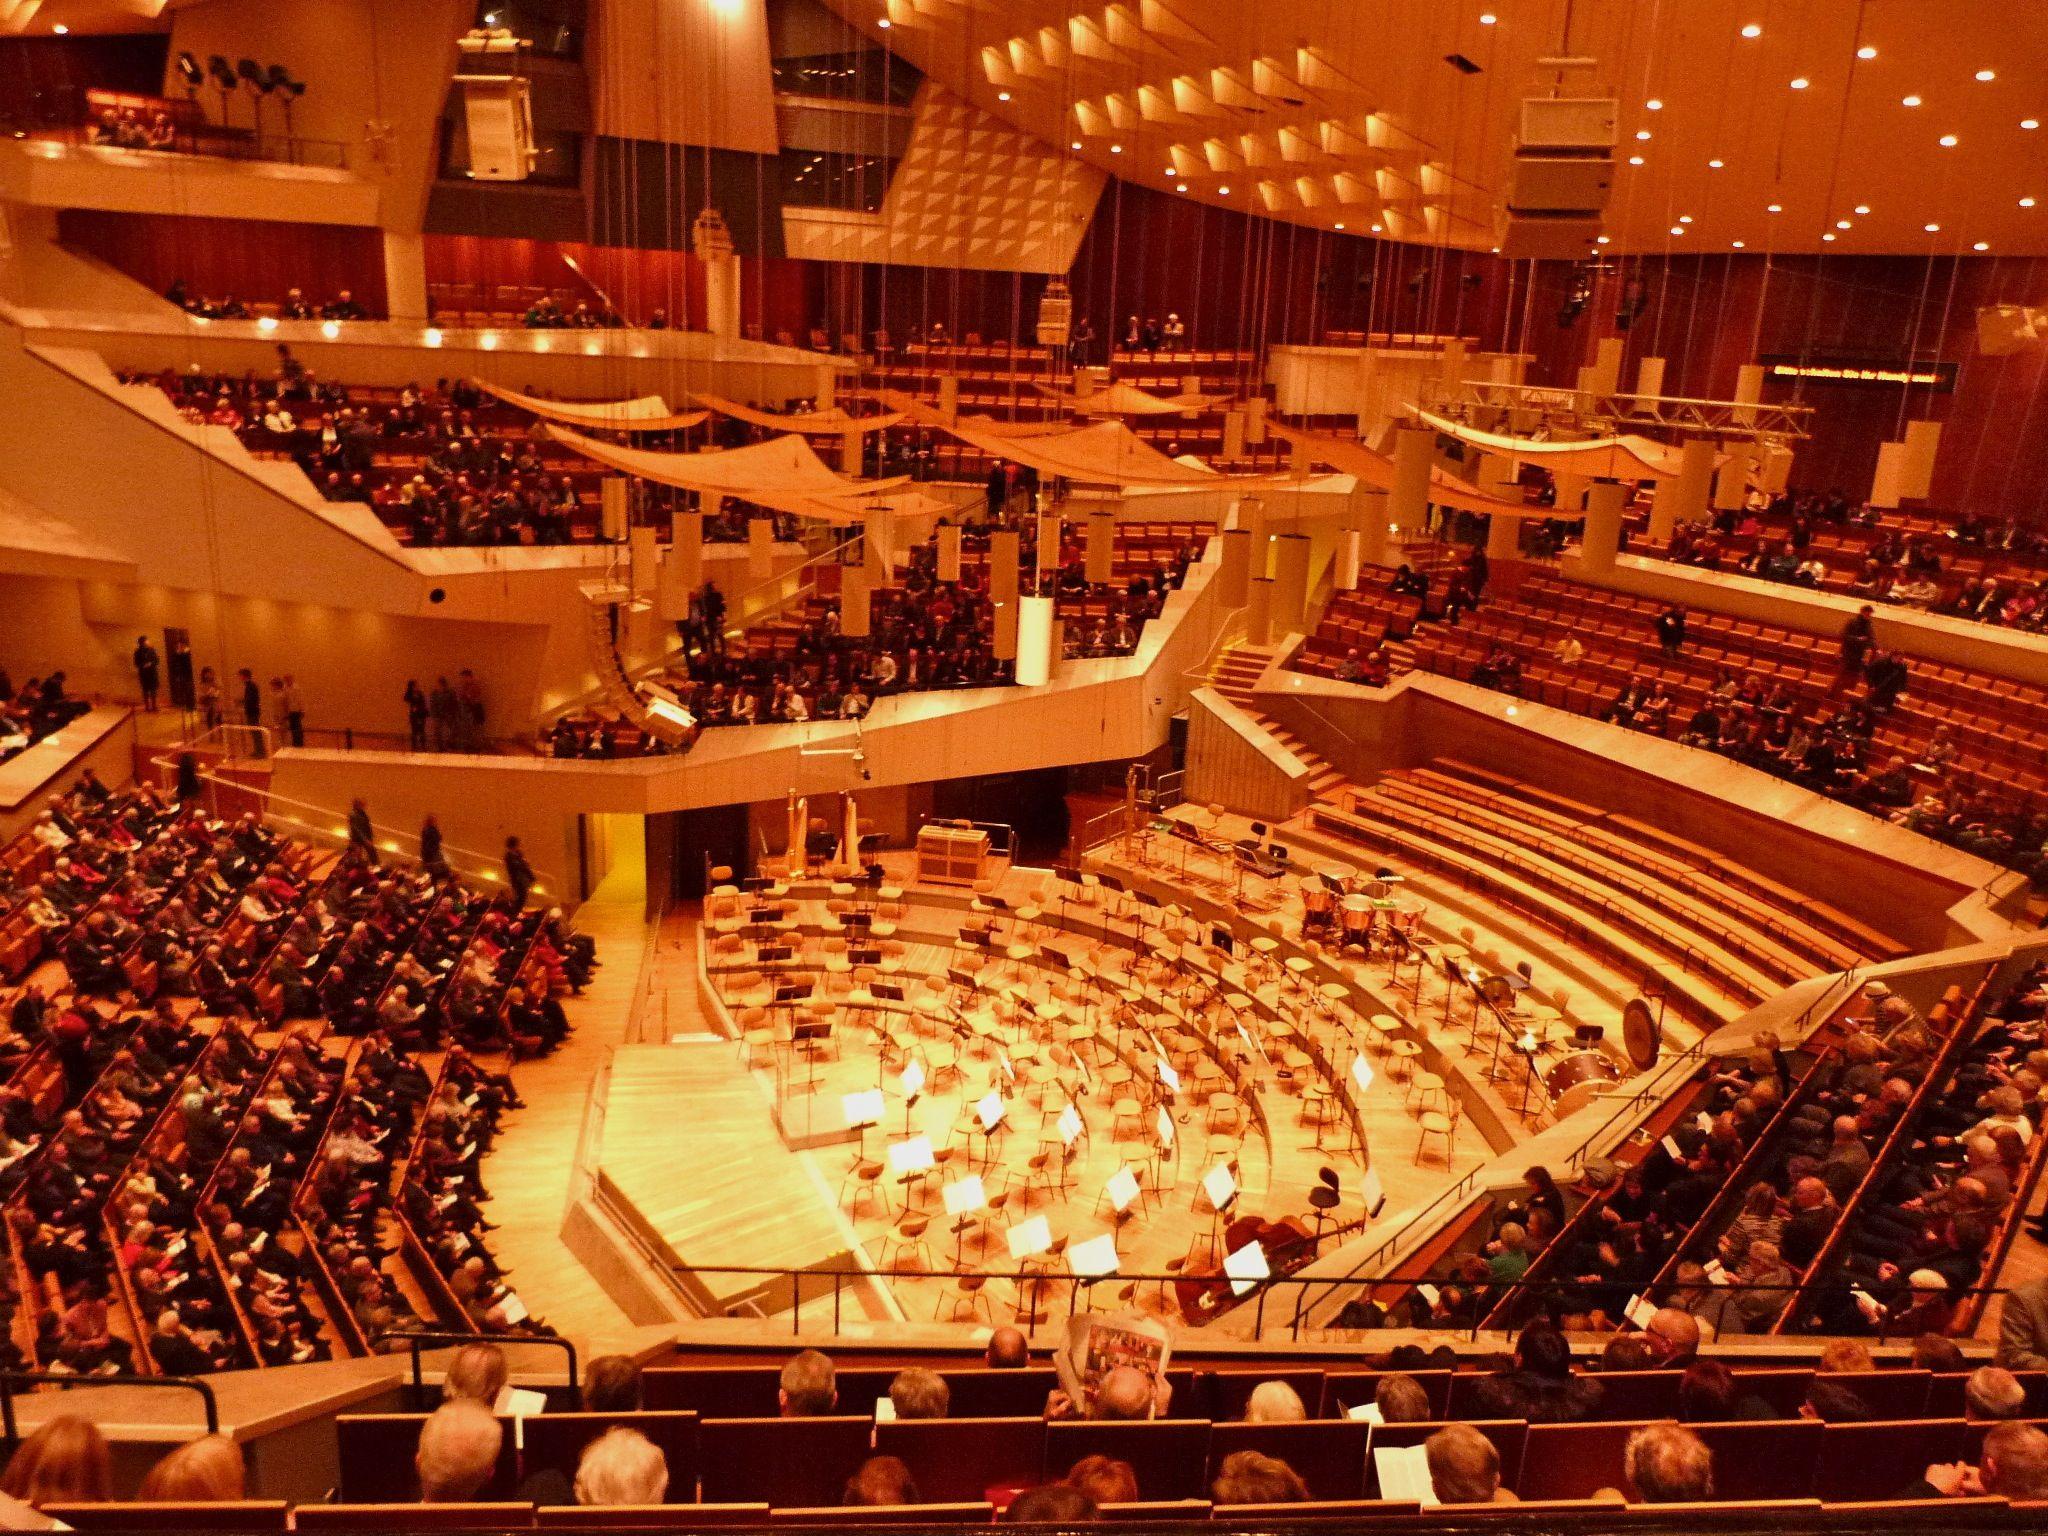 Berliner Philharmonie Concert Hall Sydney Opera House Architecture